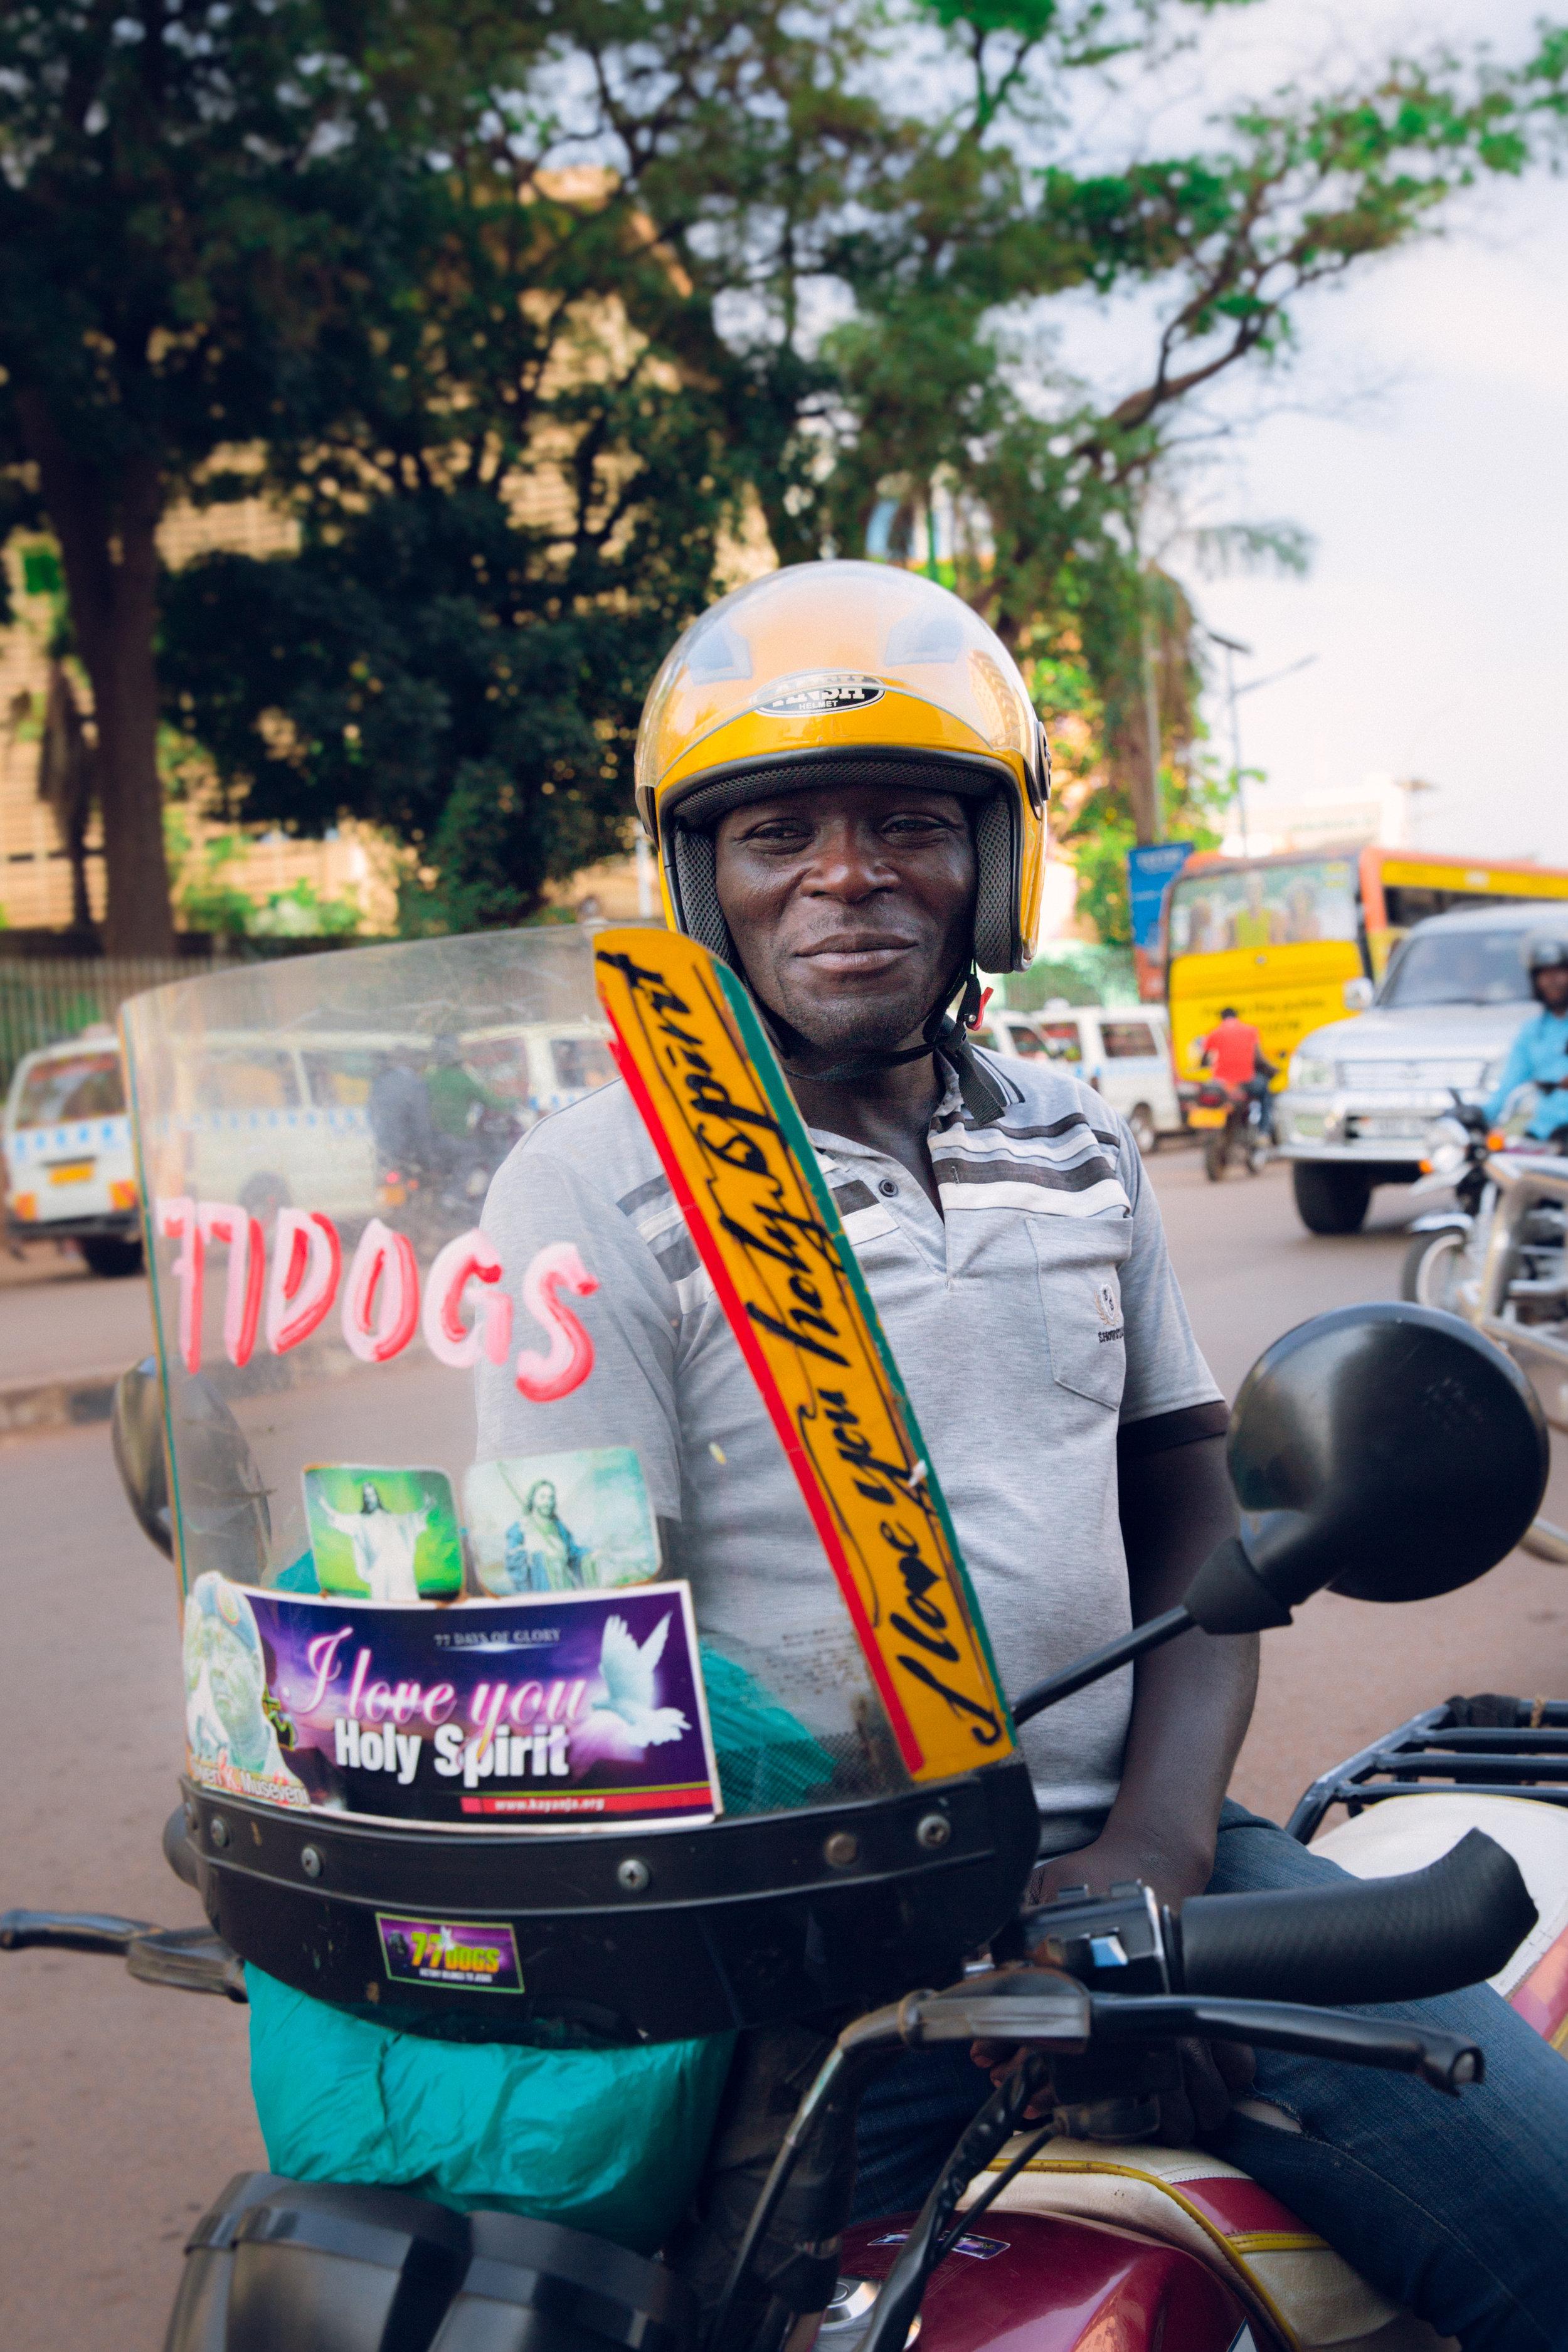 UgandaStreetPhotos-13.jpg